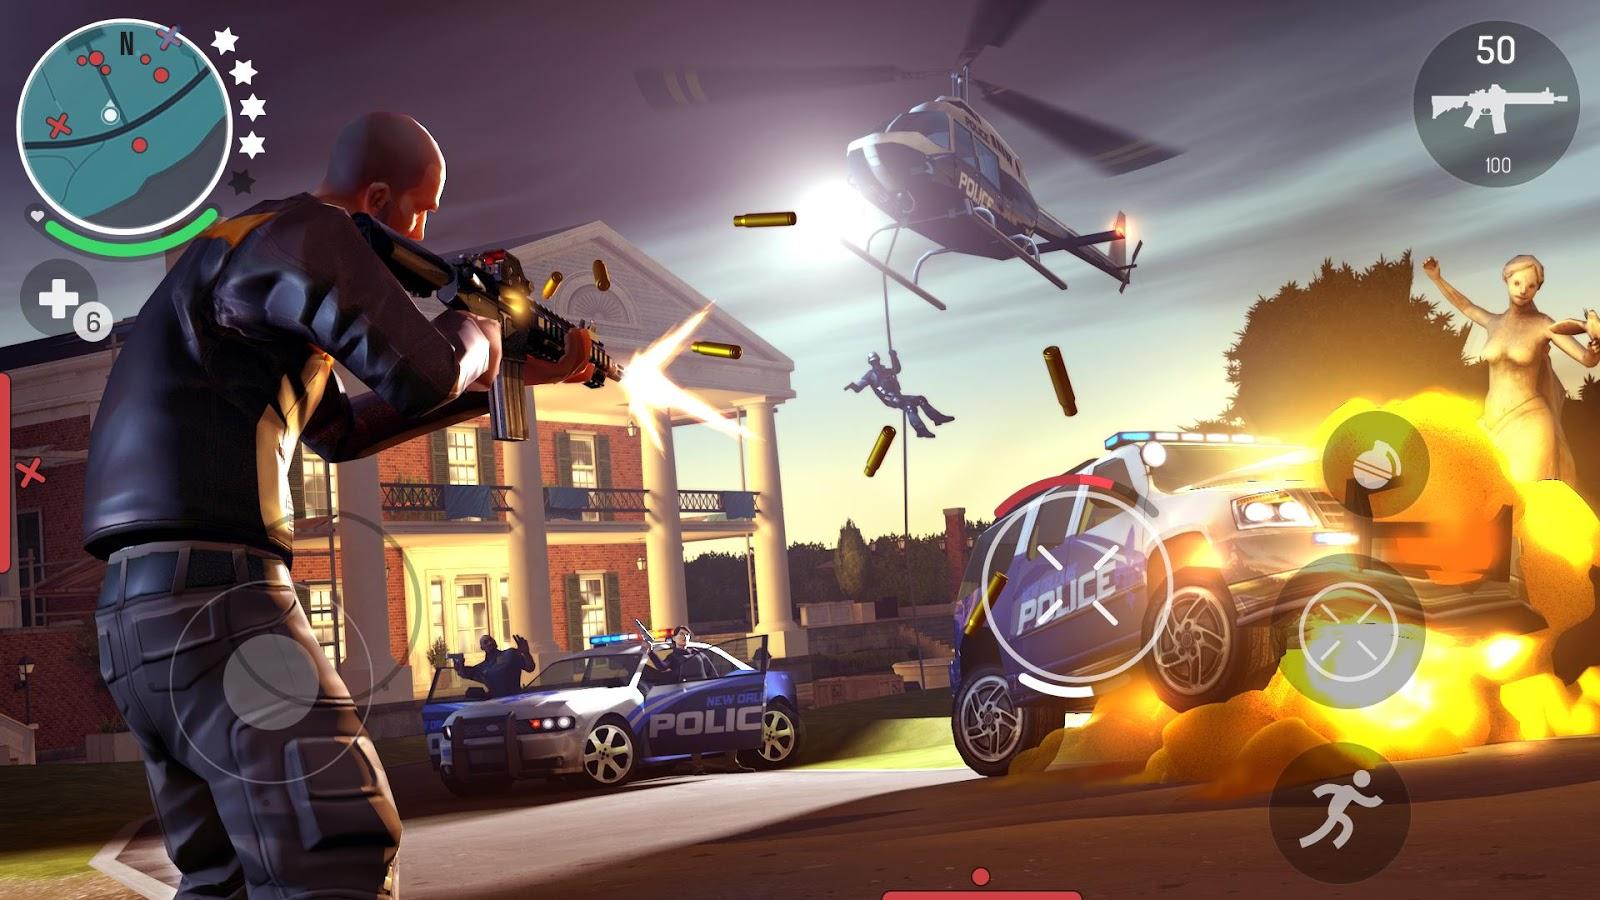 Mejores juegos gratis - Gangstar New Orleans: Open World